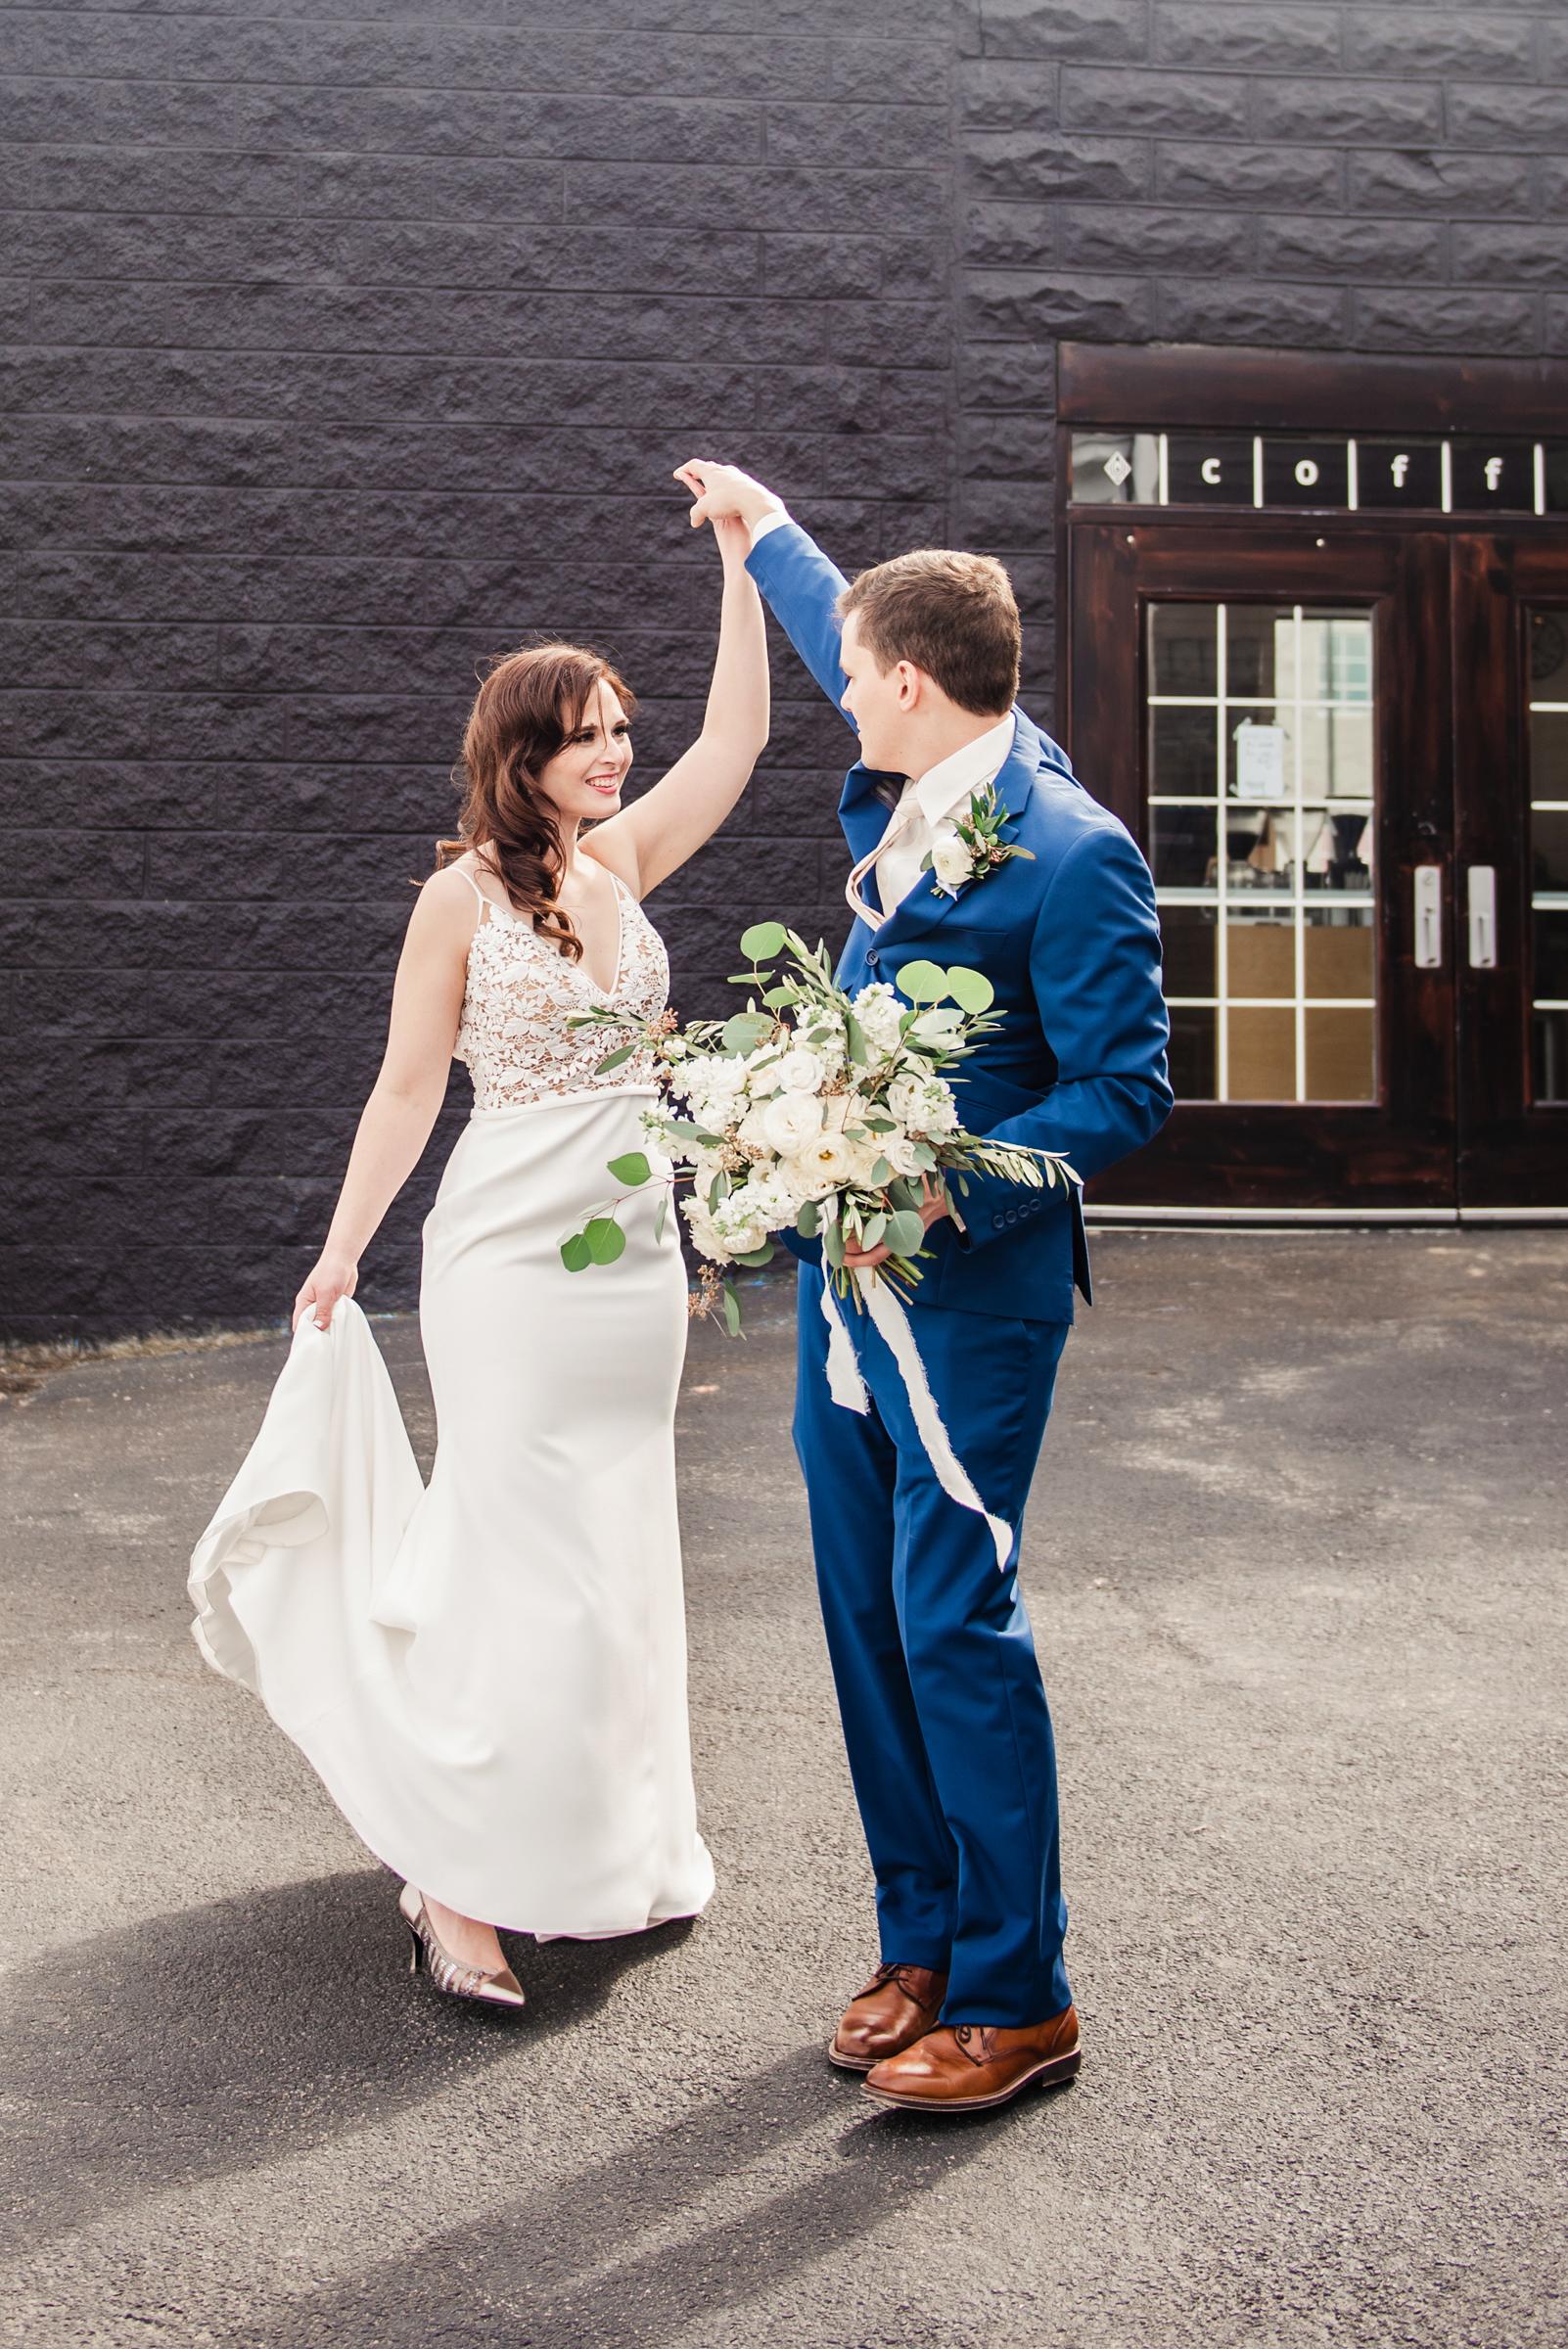 The_Arbor_LoftRochester_Wedding_JILL_STUDIO_Rochester_NY_Photographer_160500.jpg